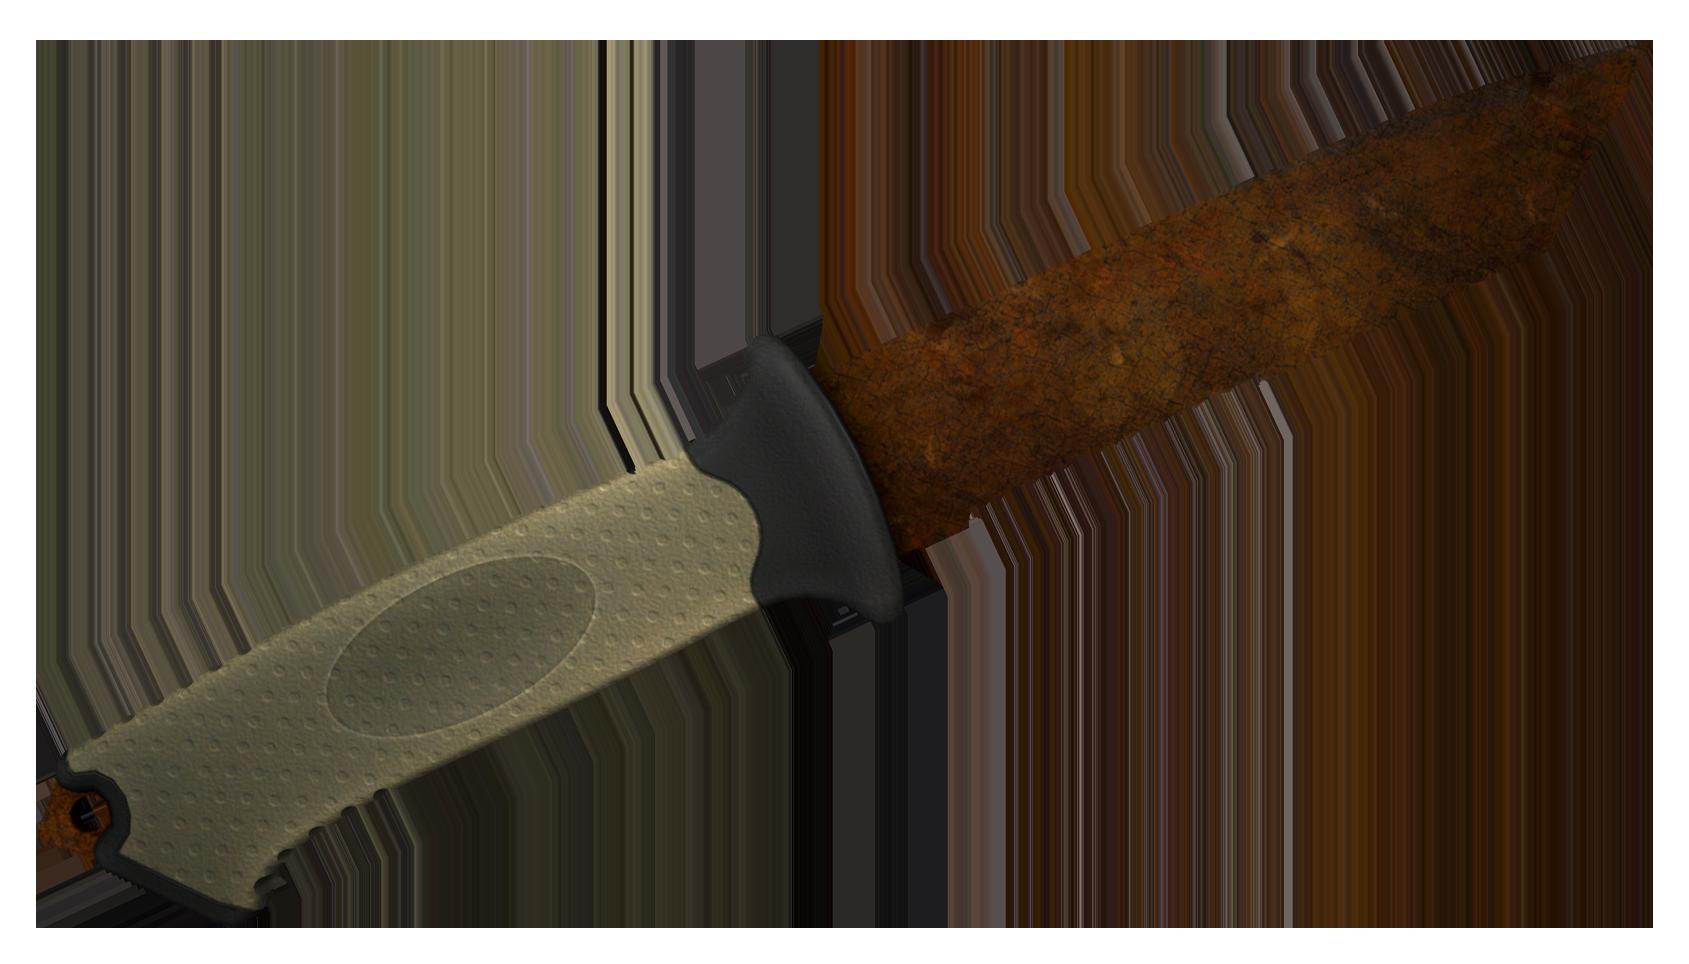 Ursus Knife Rust Coat Large Rendering